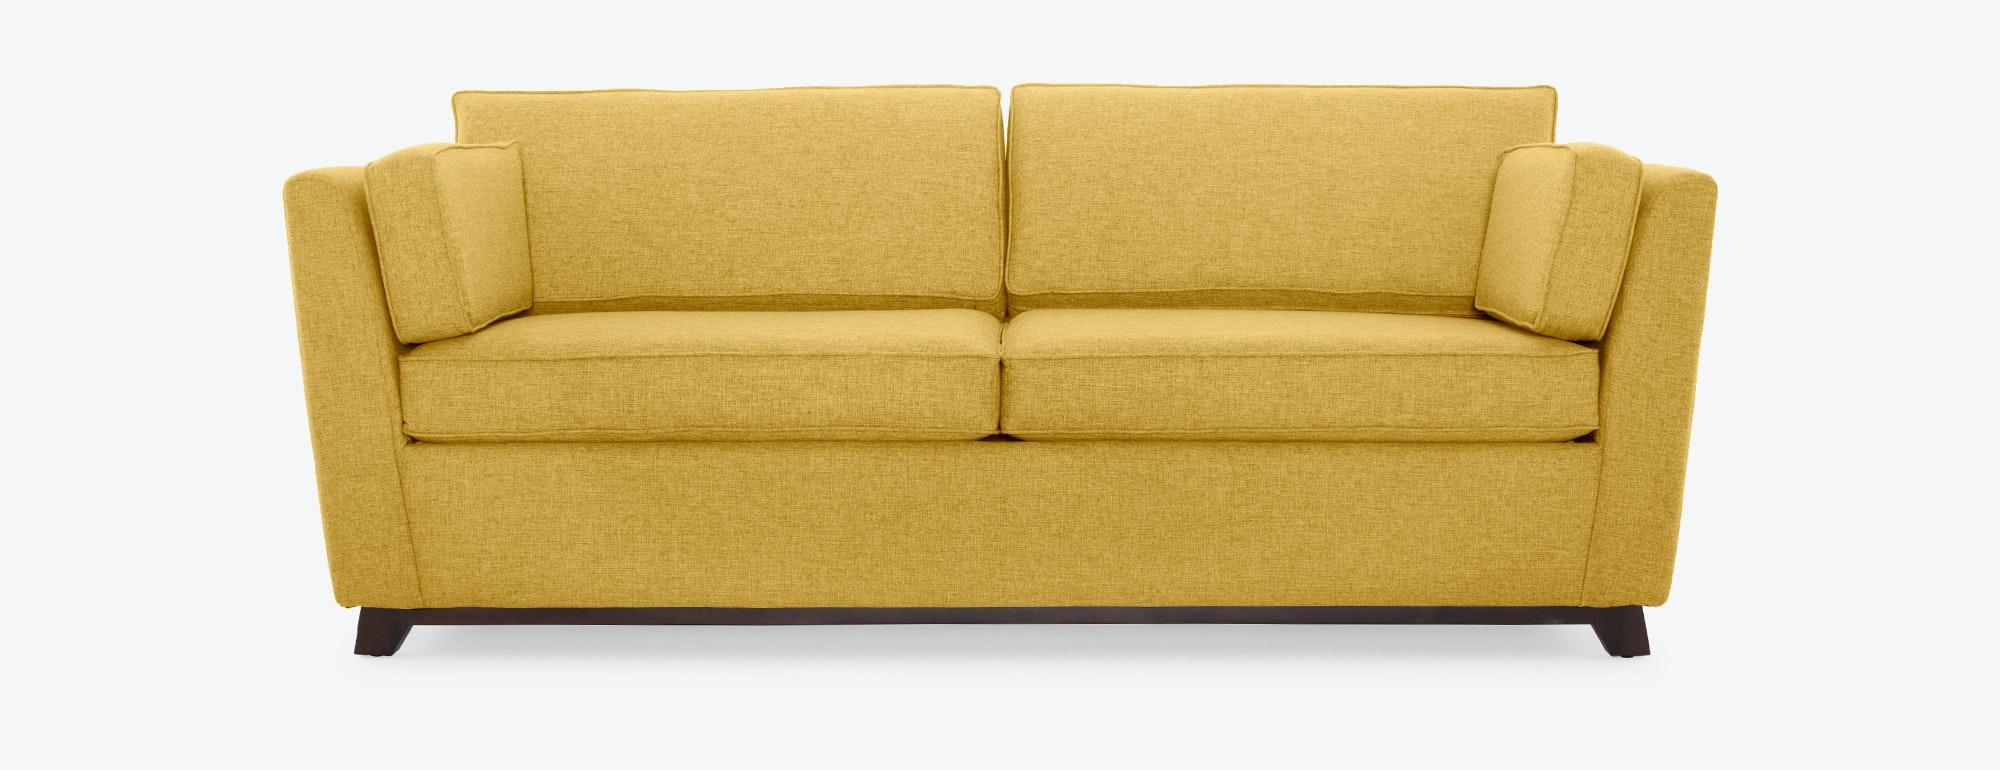 Wohnzimmer couch roller inspiration design for Roller wohnzimmer couch